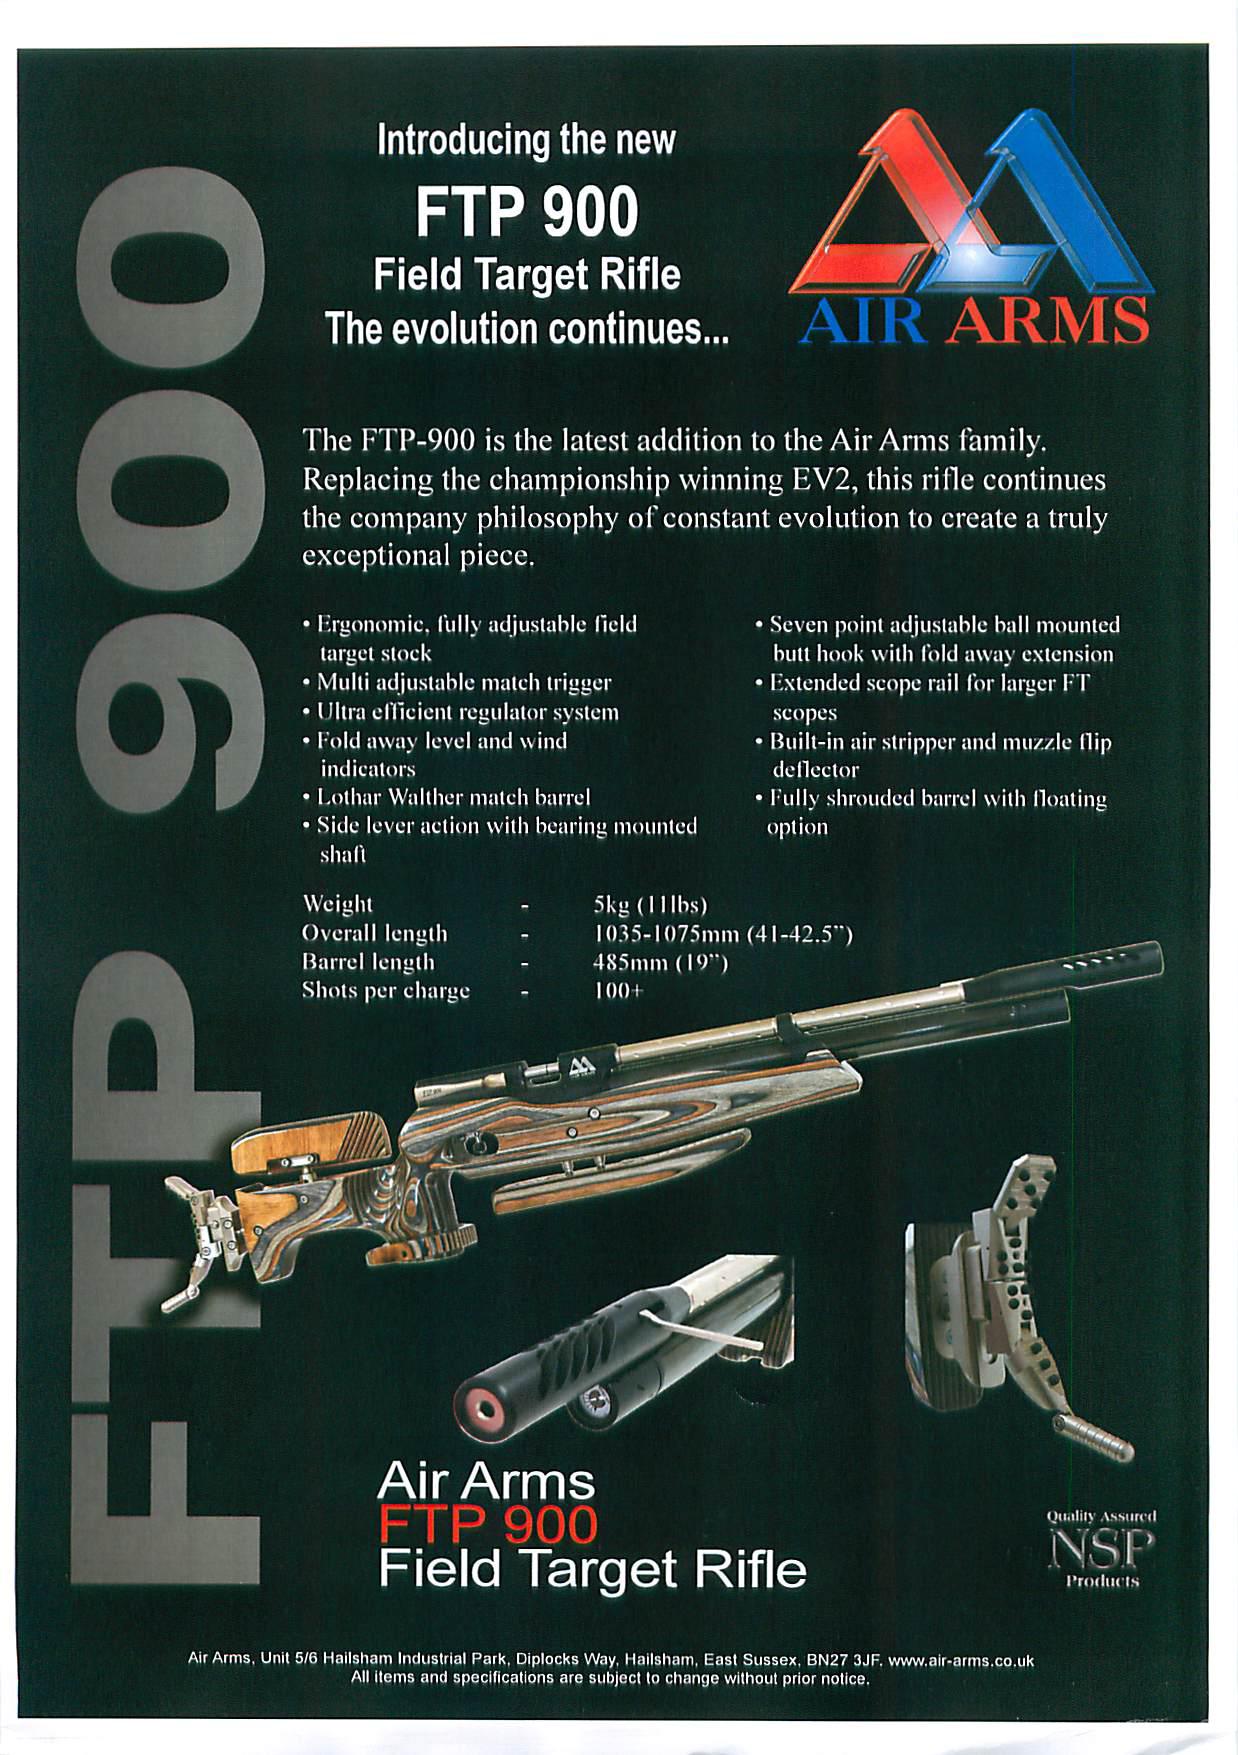 AA FTP 900 1